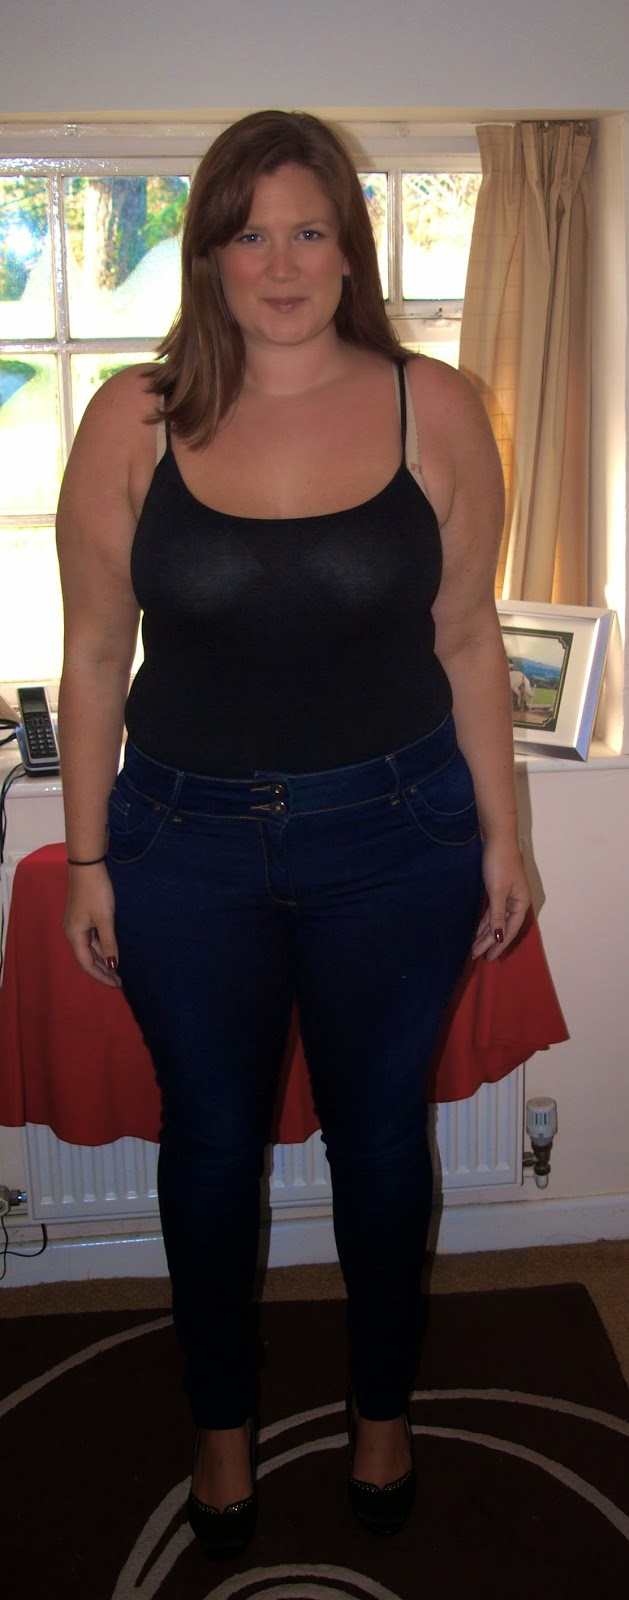 Curvy Girl Thin: A jean day ...